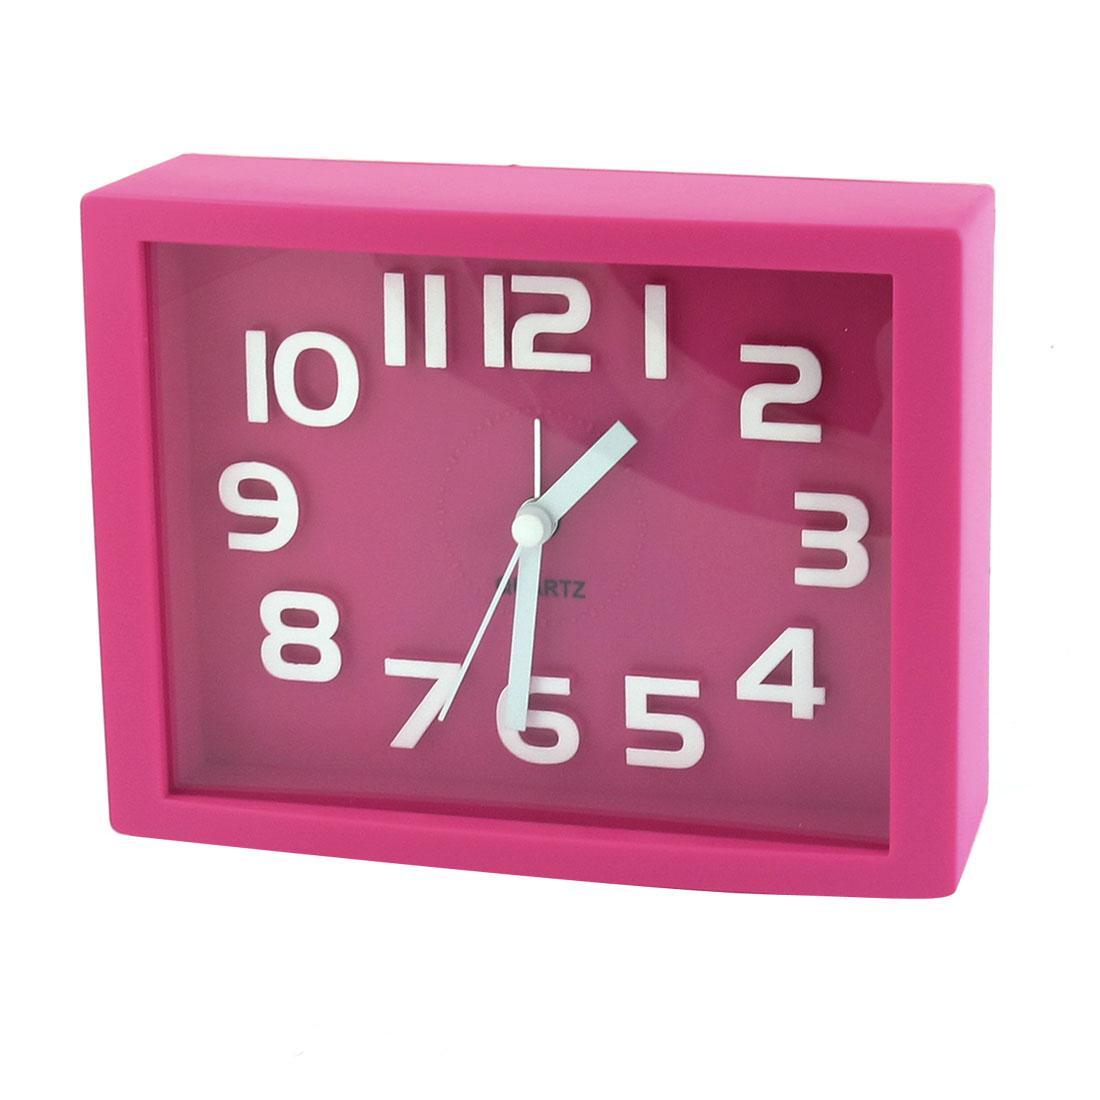 White Plastic Arabic Number Marking Square Dial Alarm Clock Fuchsia